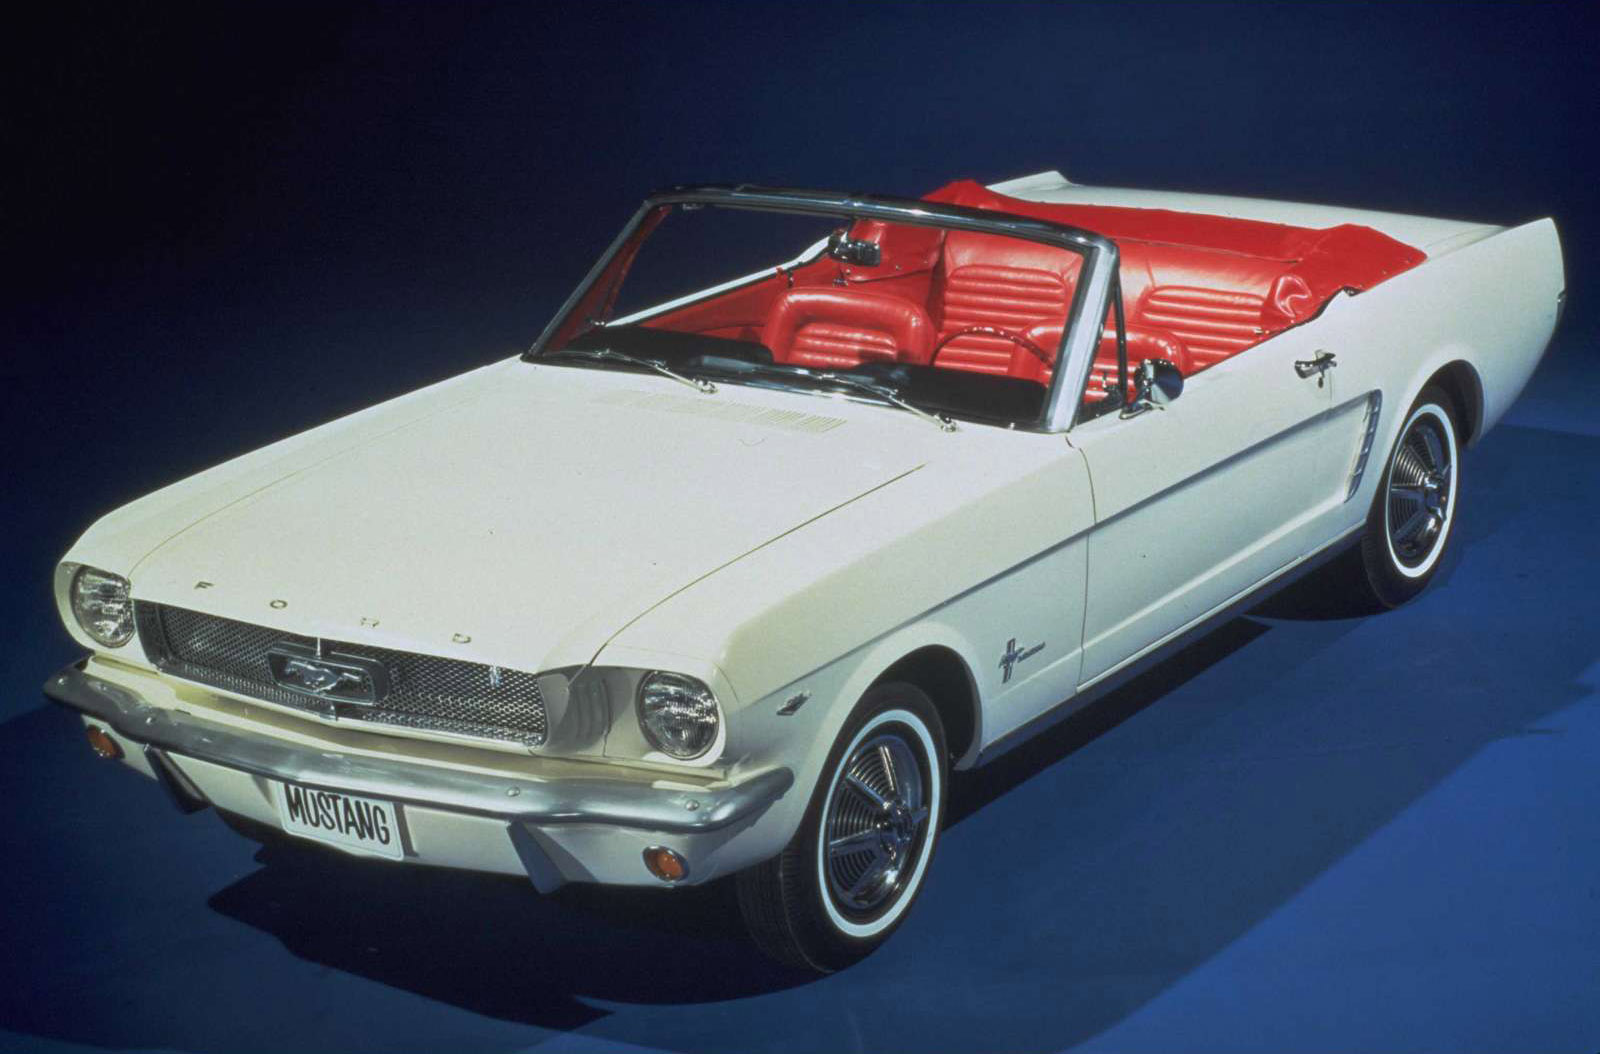 1964 Mustang Length